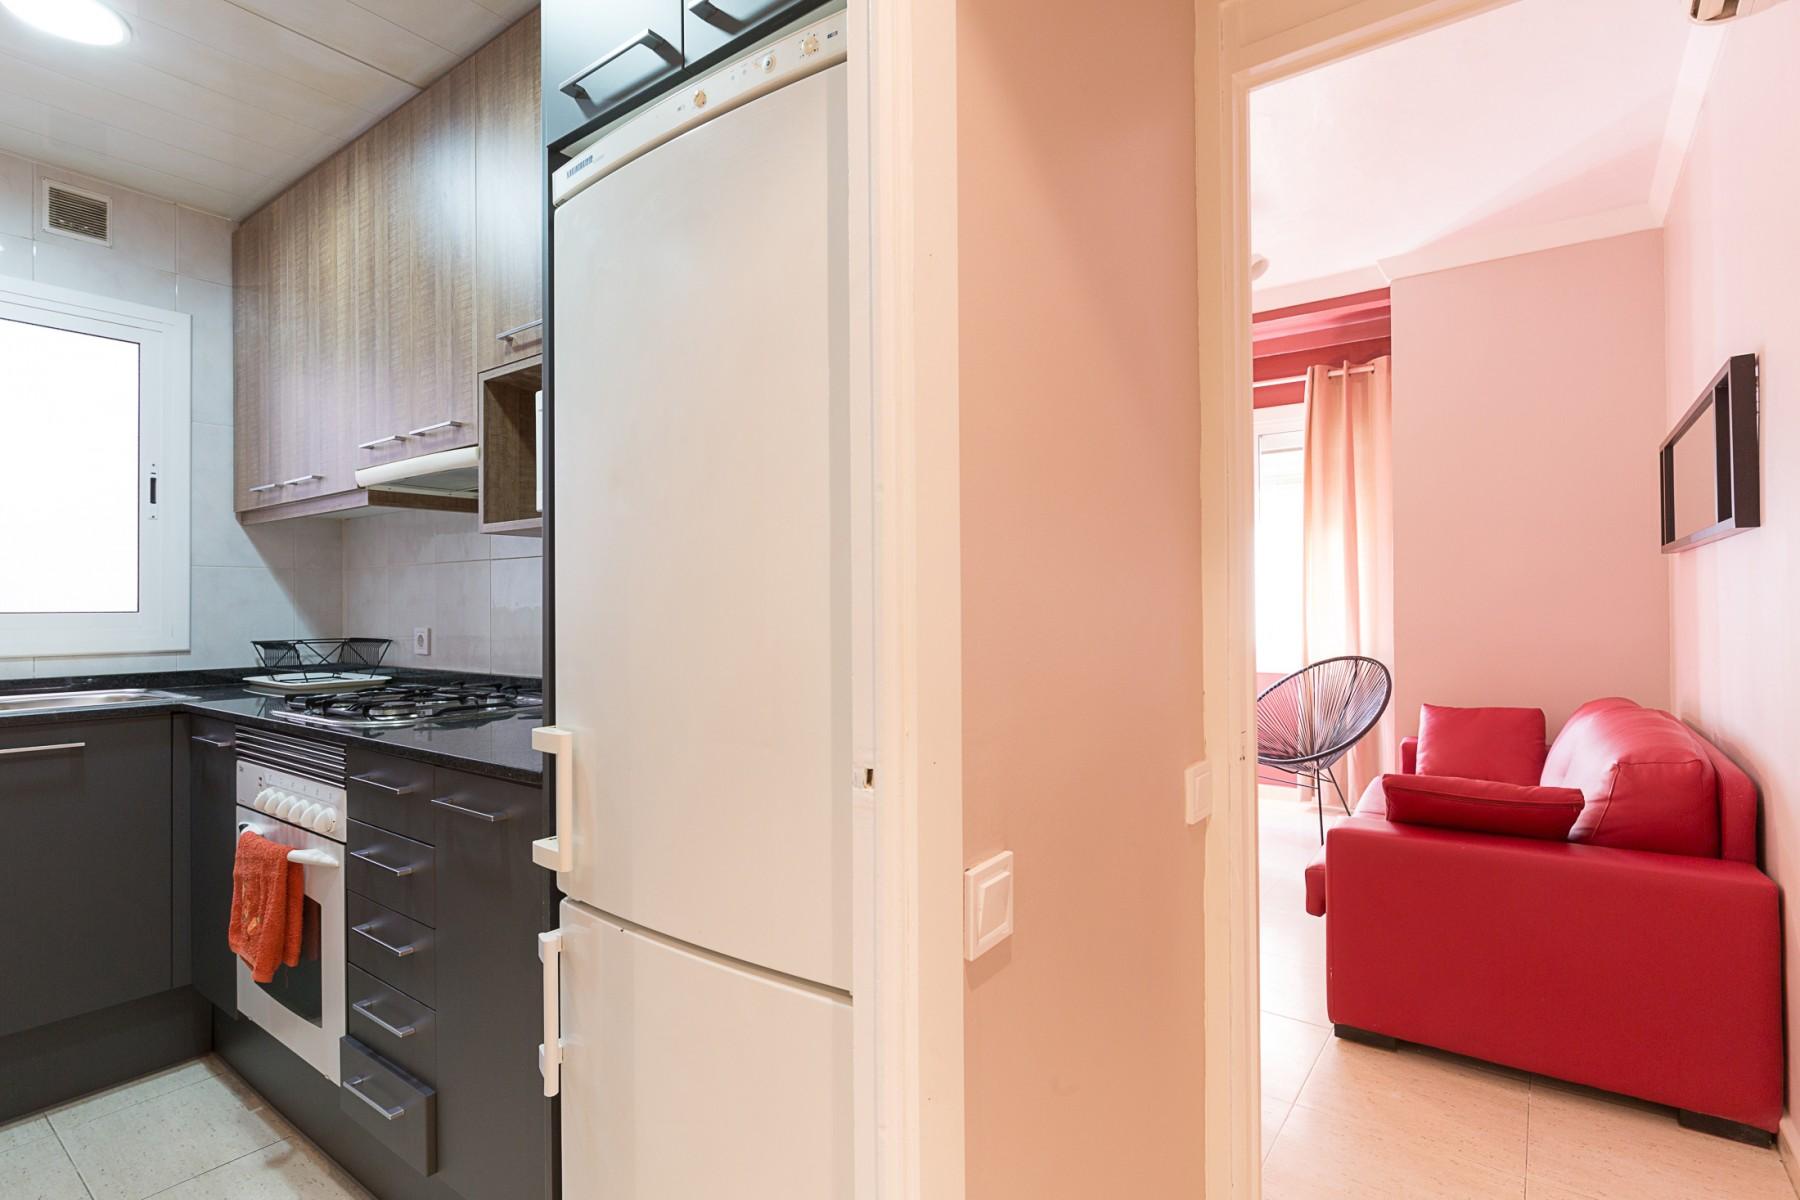 Apartamento plaza espa a barcelona - Menaje cocina barcelona ...